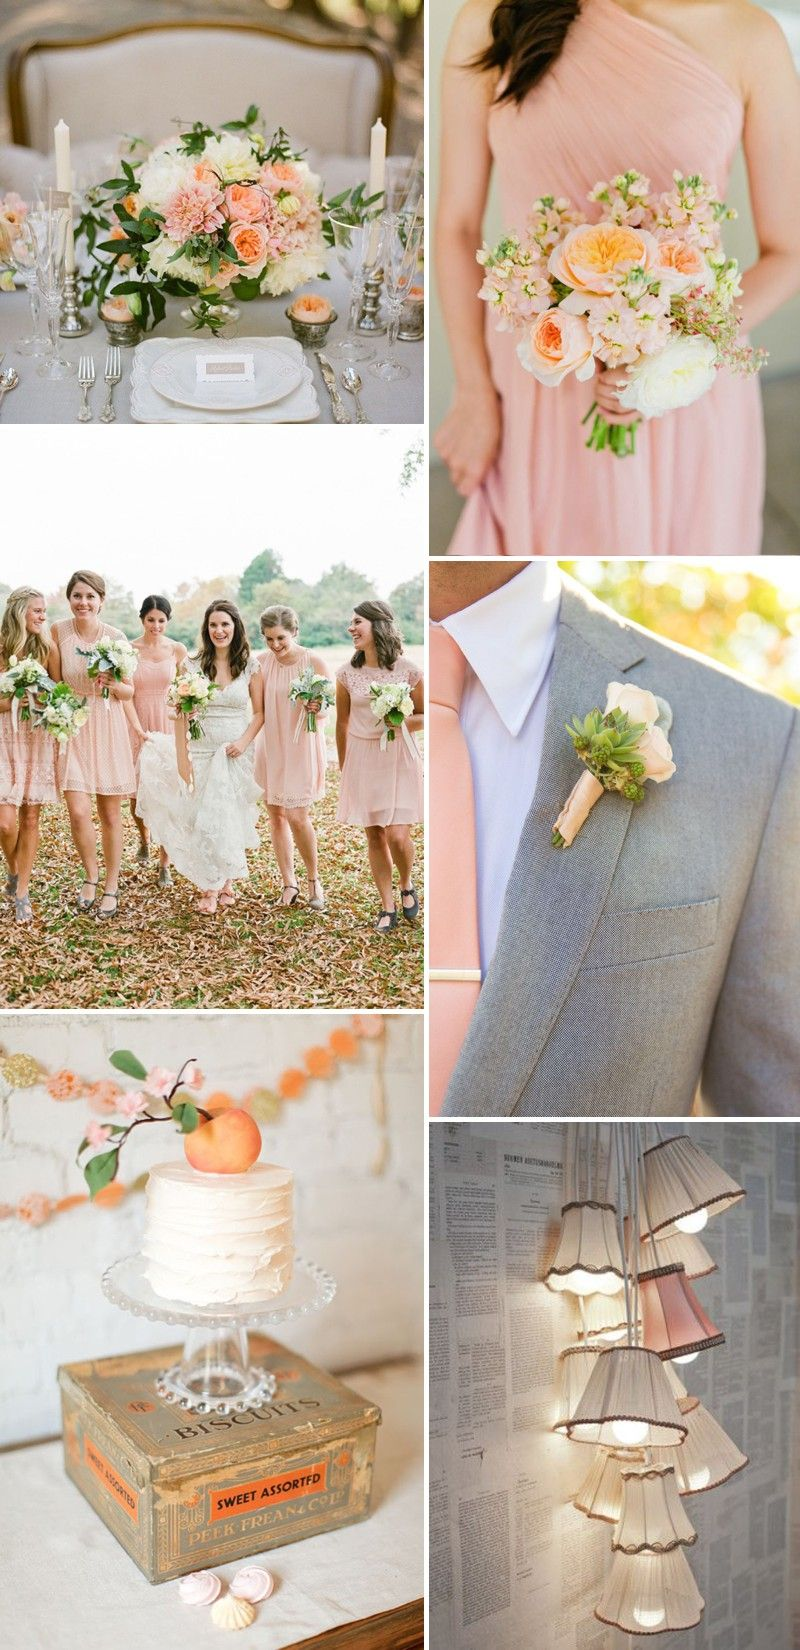 How To Create A Peach Colour Themed Wedding Using Flowers